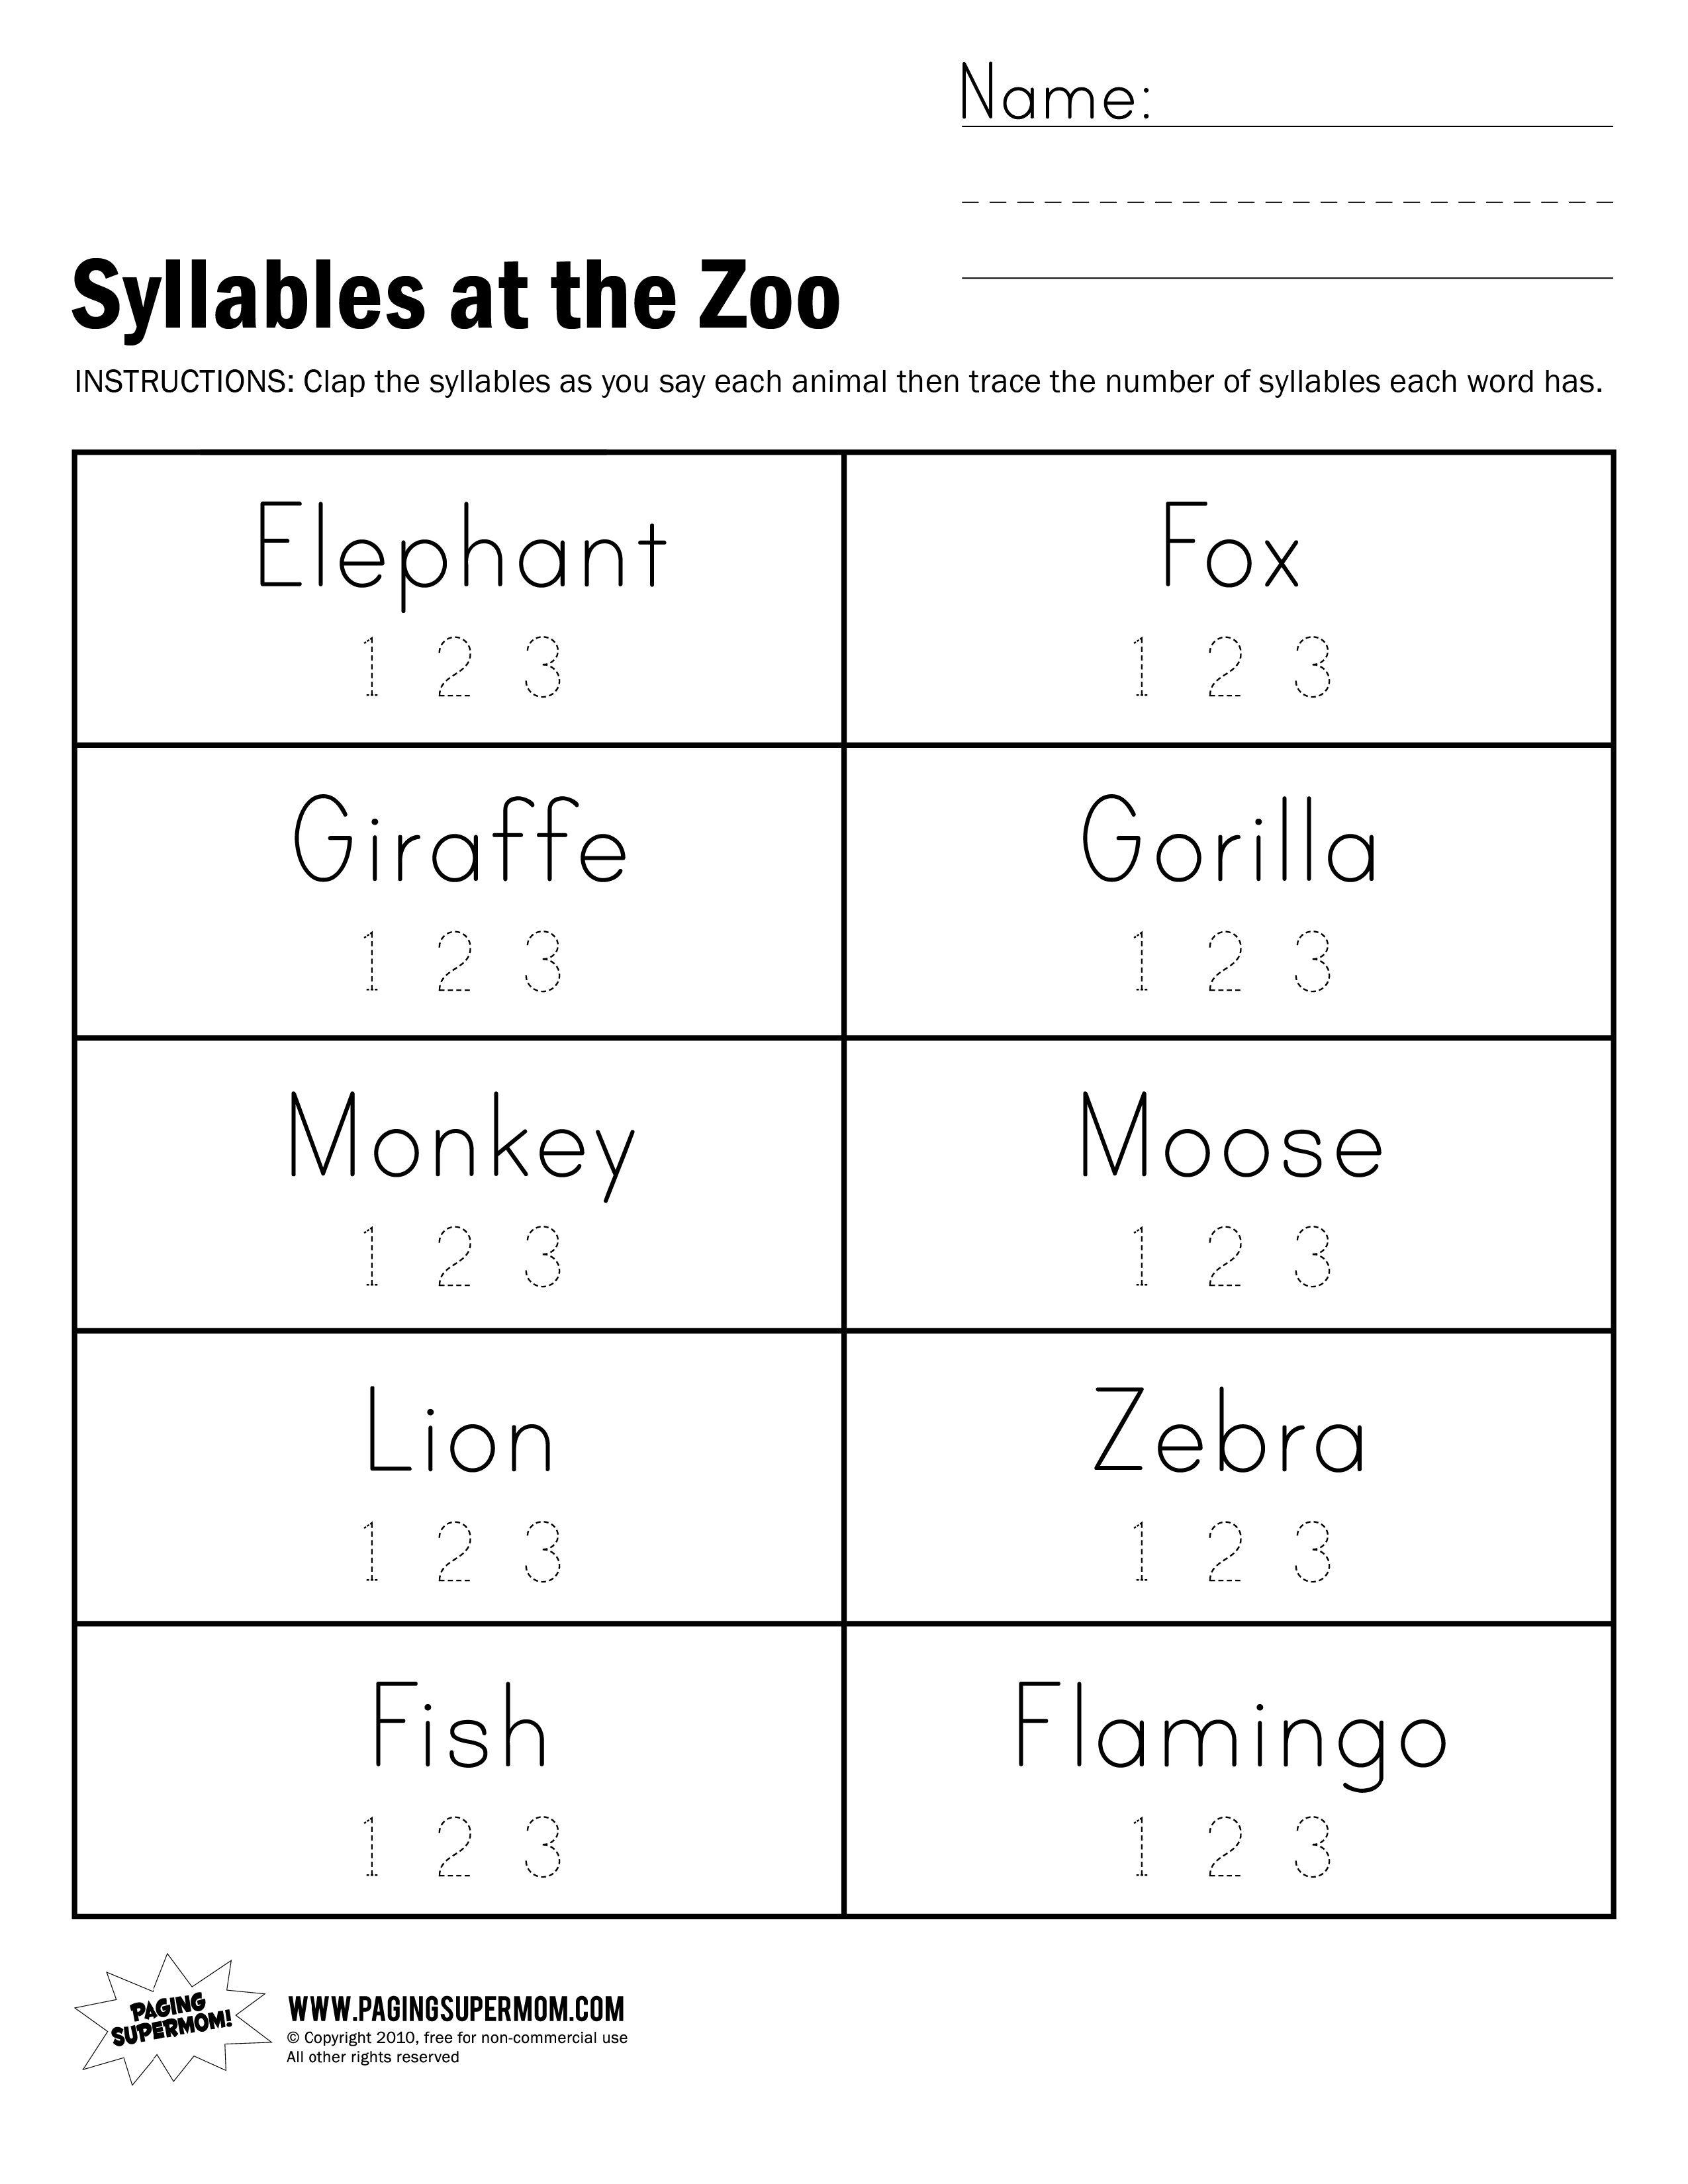 medium resolution of Syllables at the Zoo Worksheet   Syllable worksheet